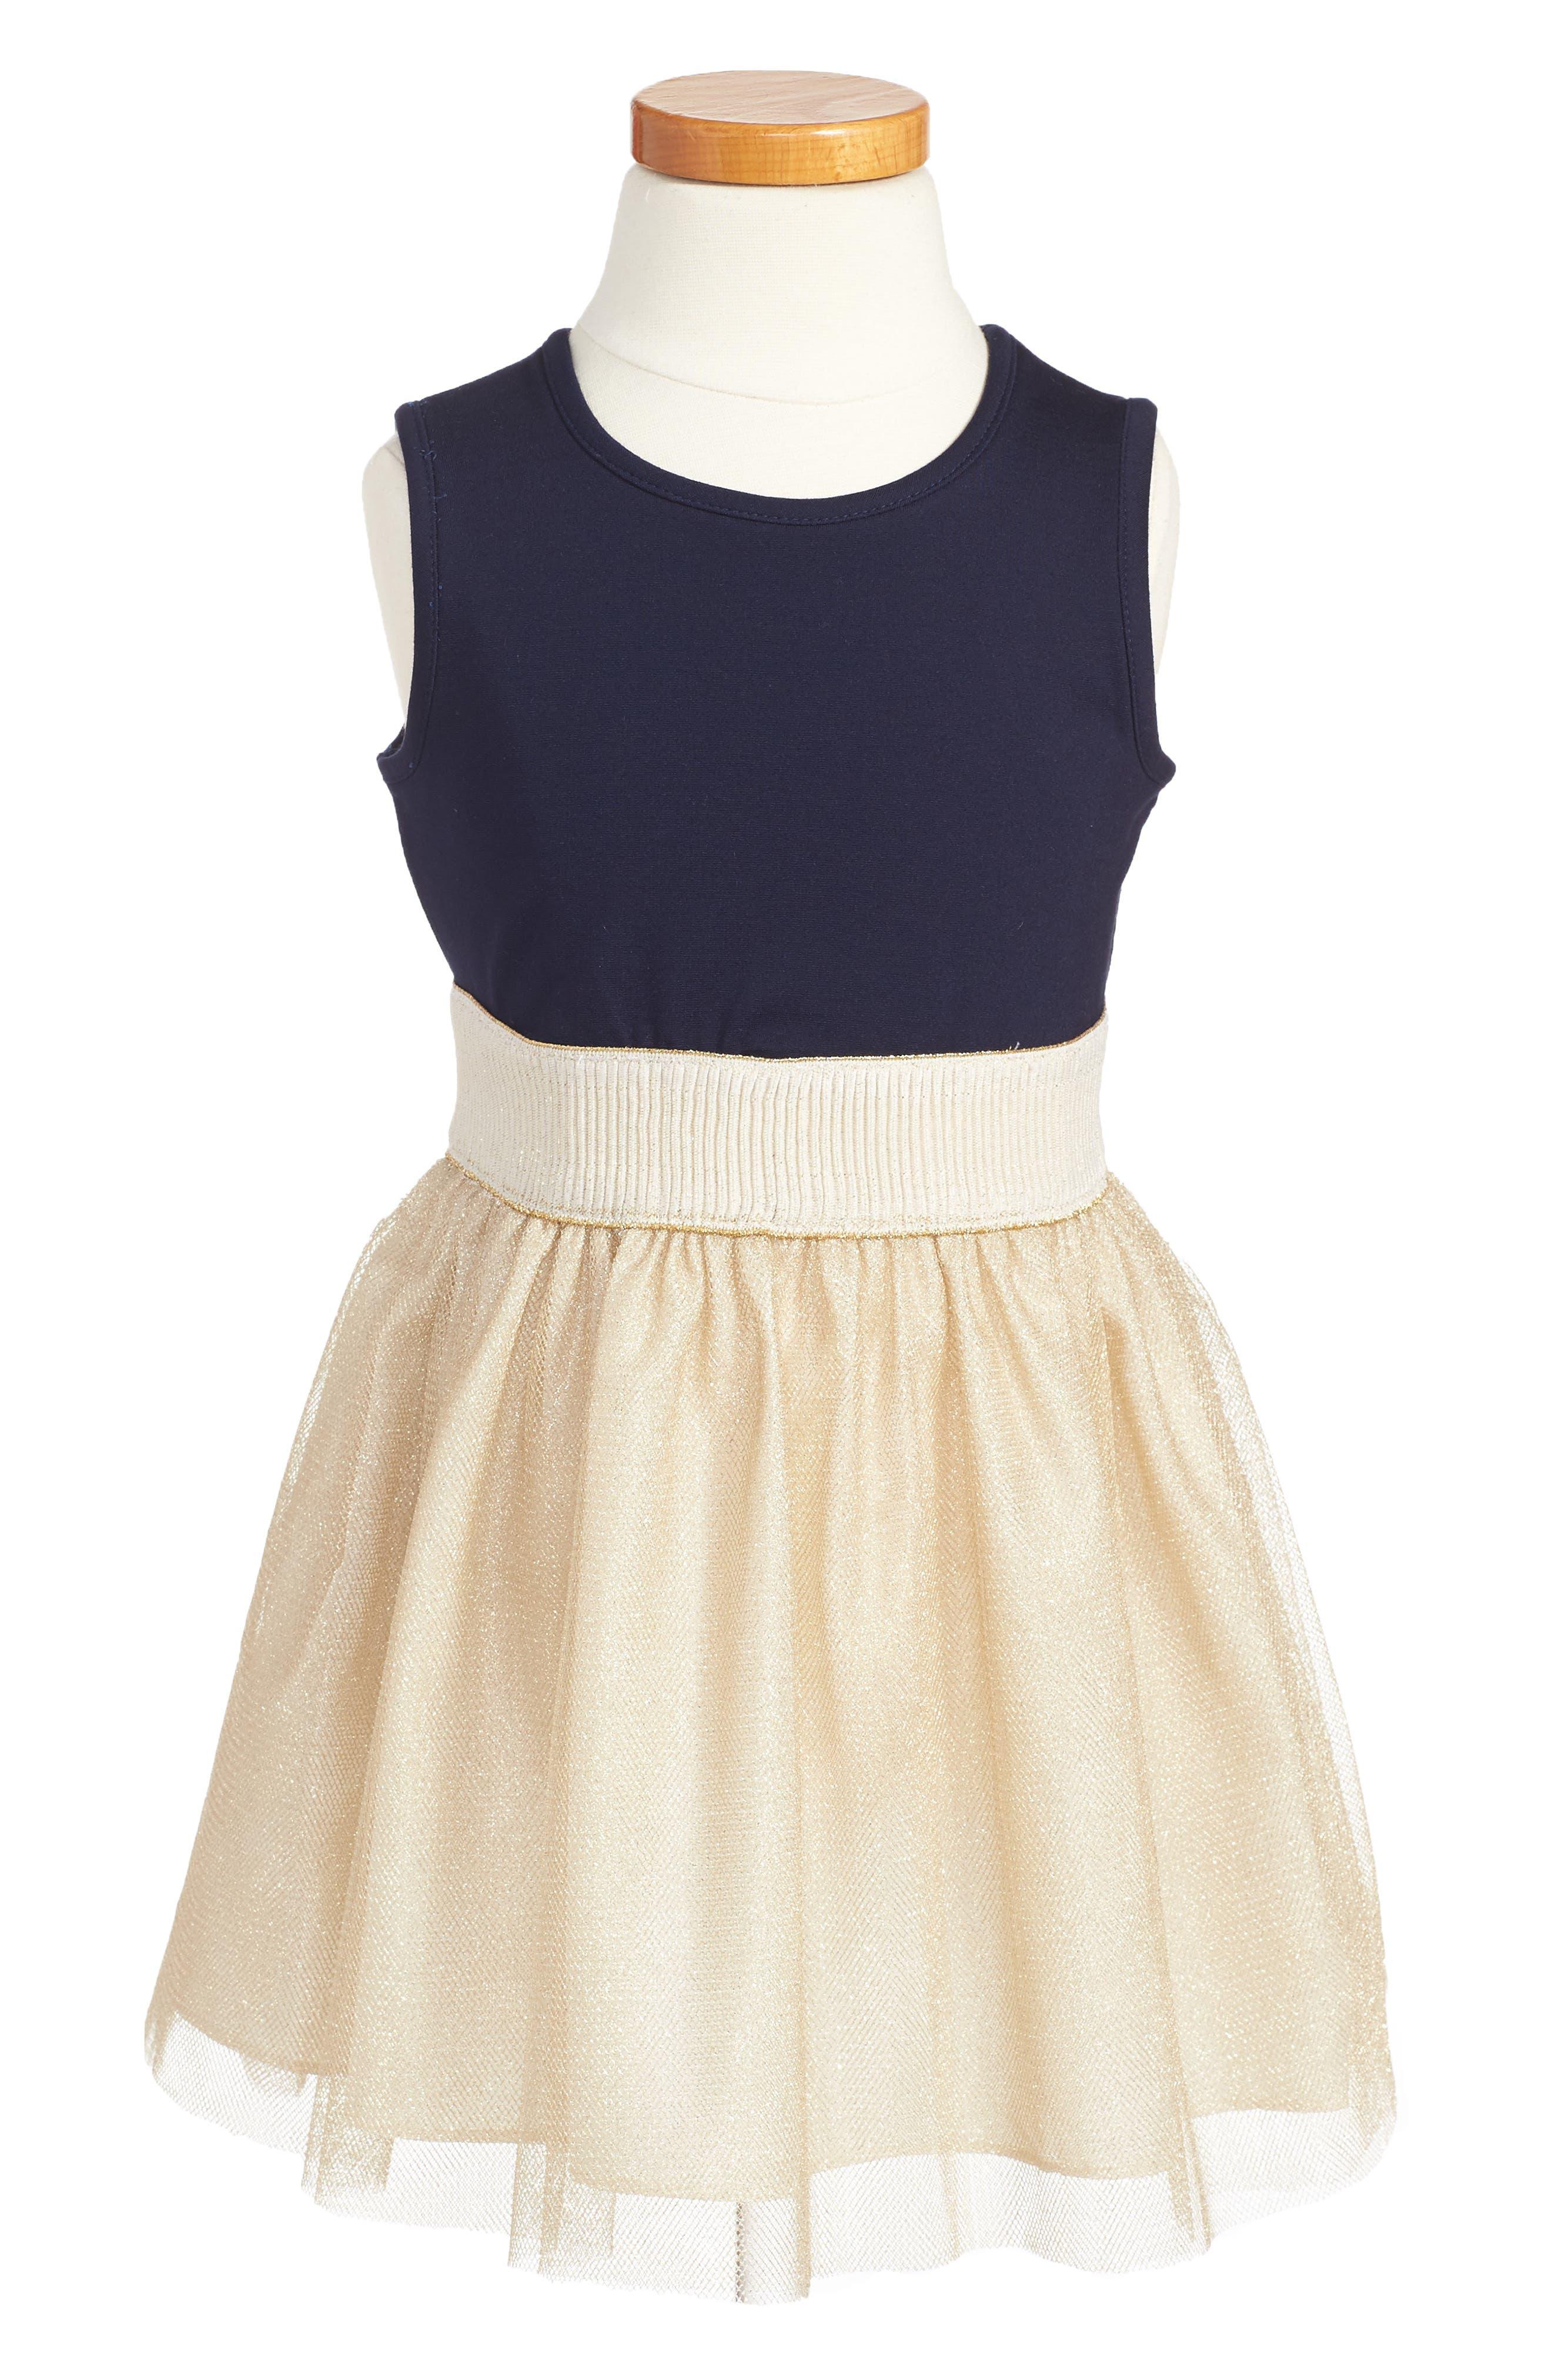 Majorette Jacket & Tank Dress Set,                             Main thumbnail 1, color,                             407